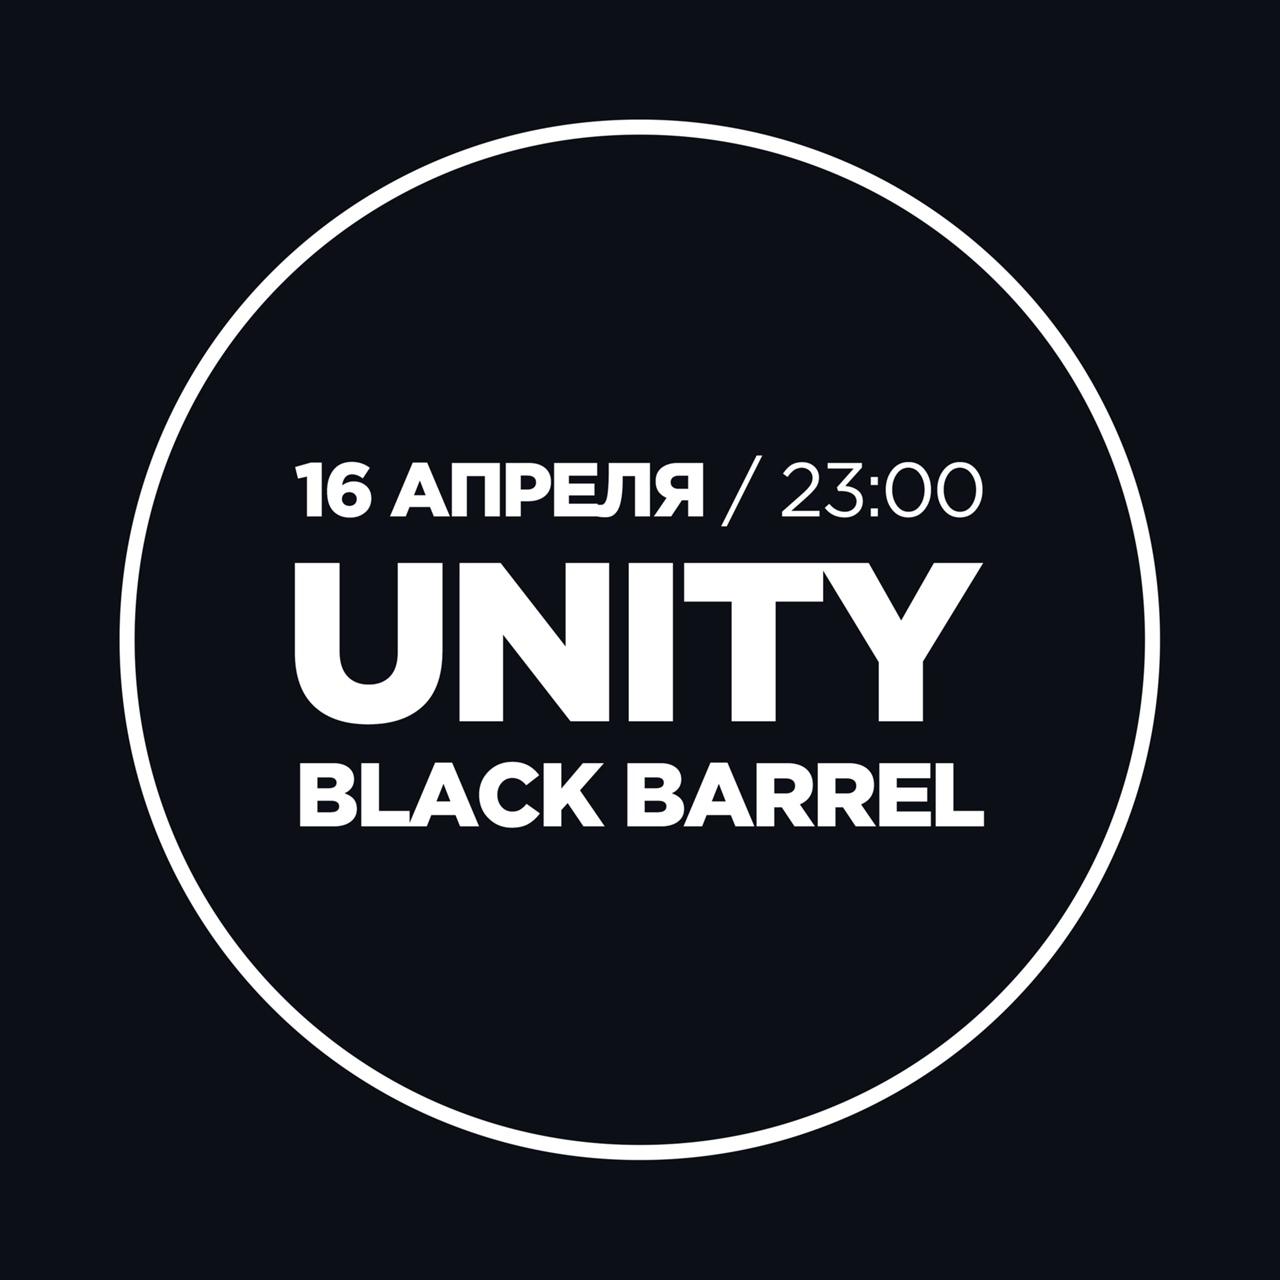 Афиша Екатеринбург 16 апреля UNITY w/ BLACK BARREL «Ц»